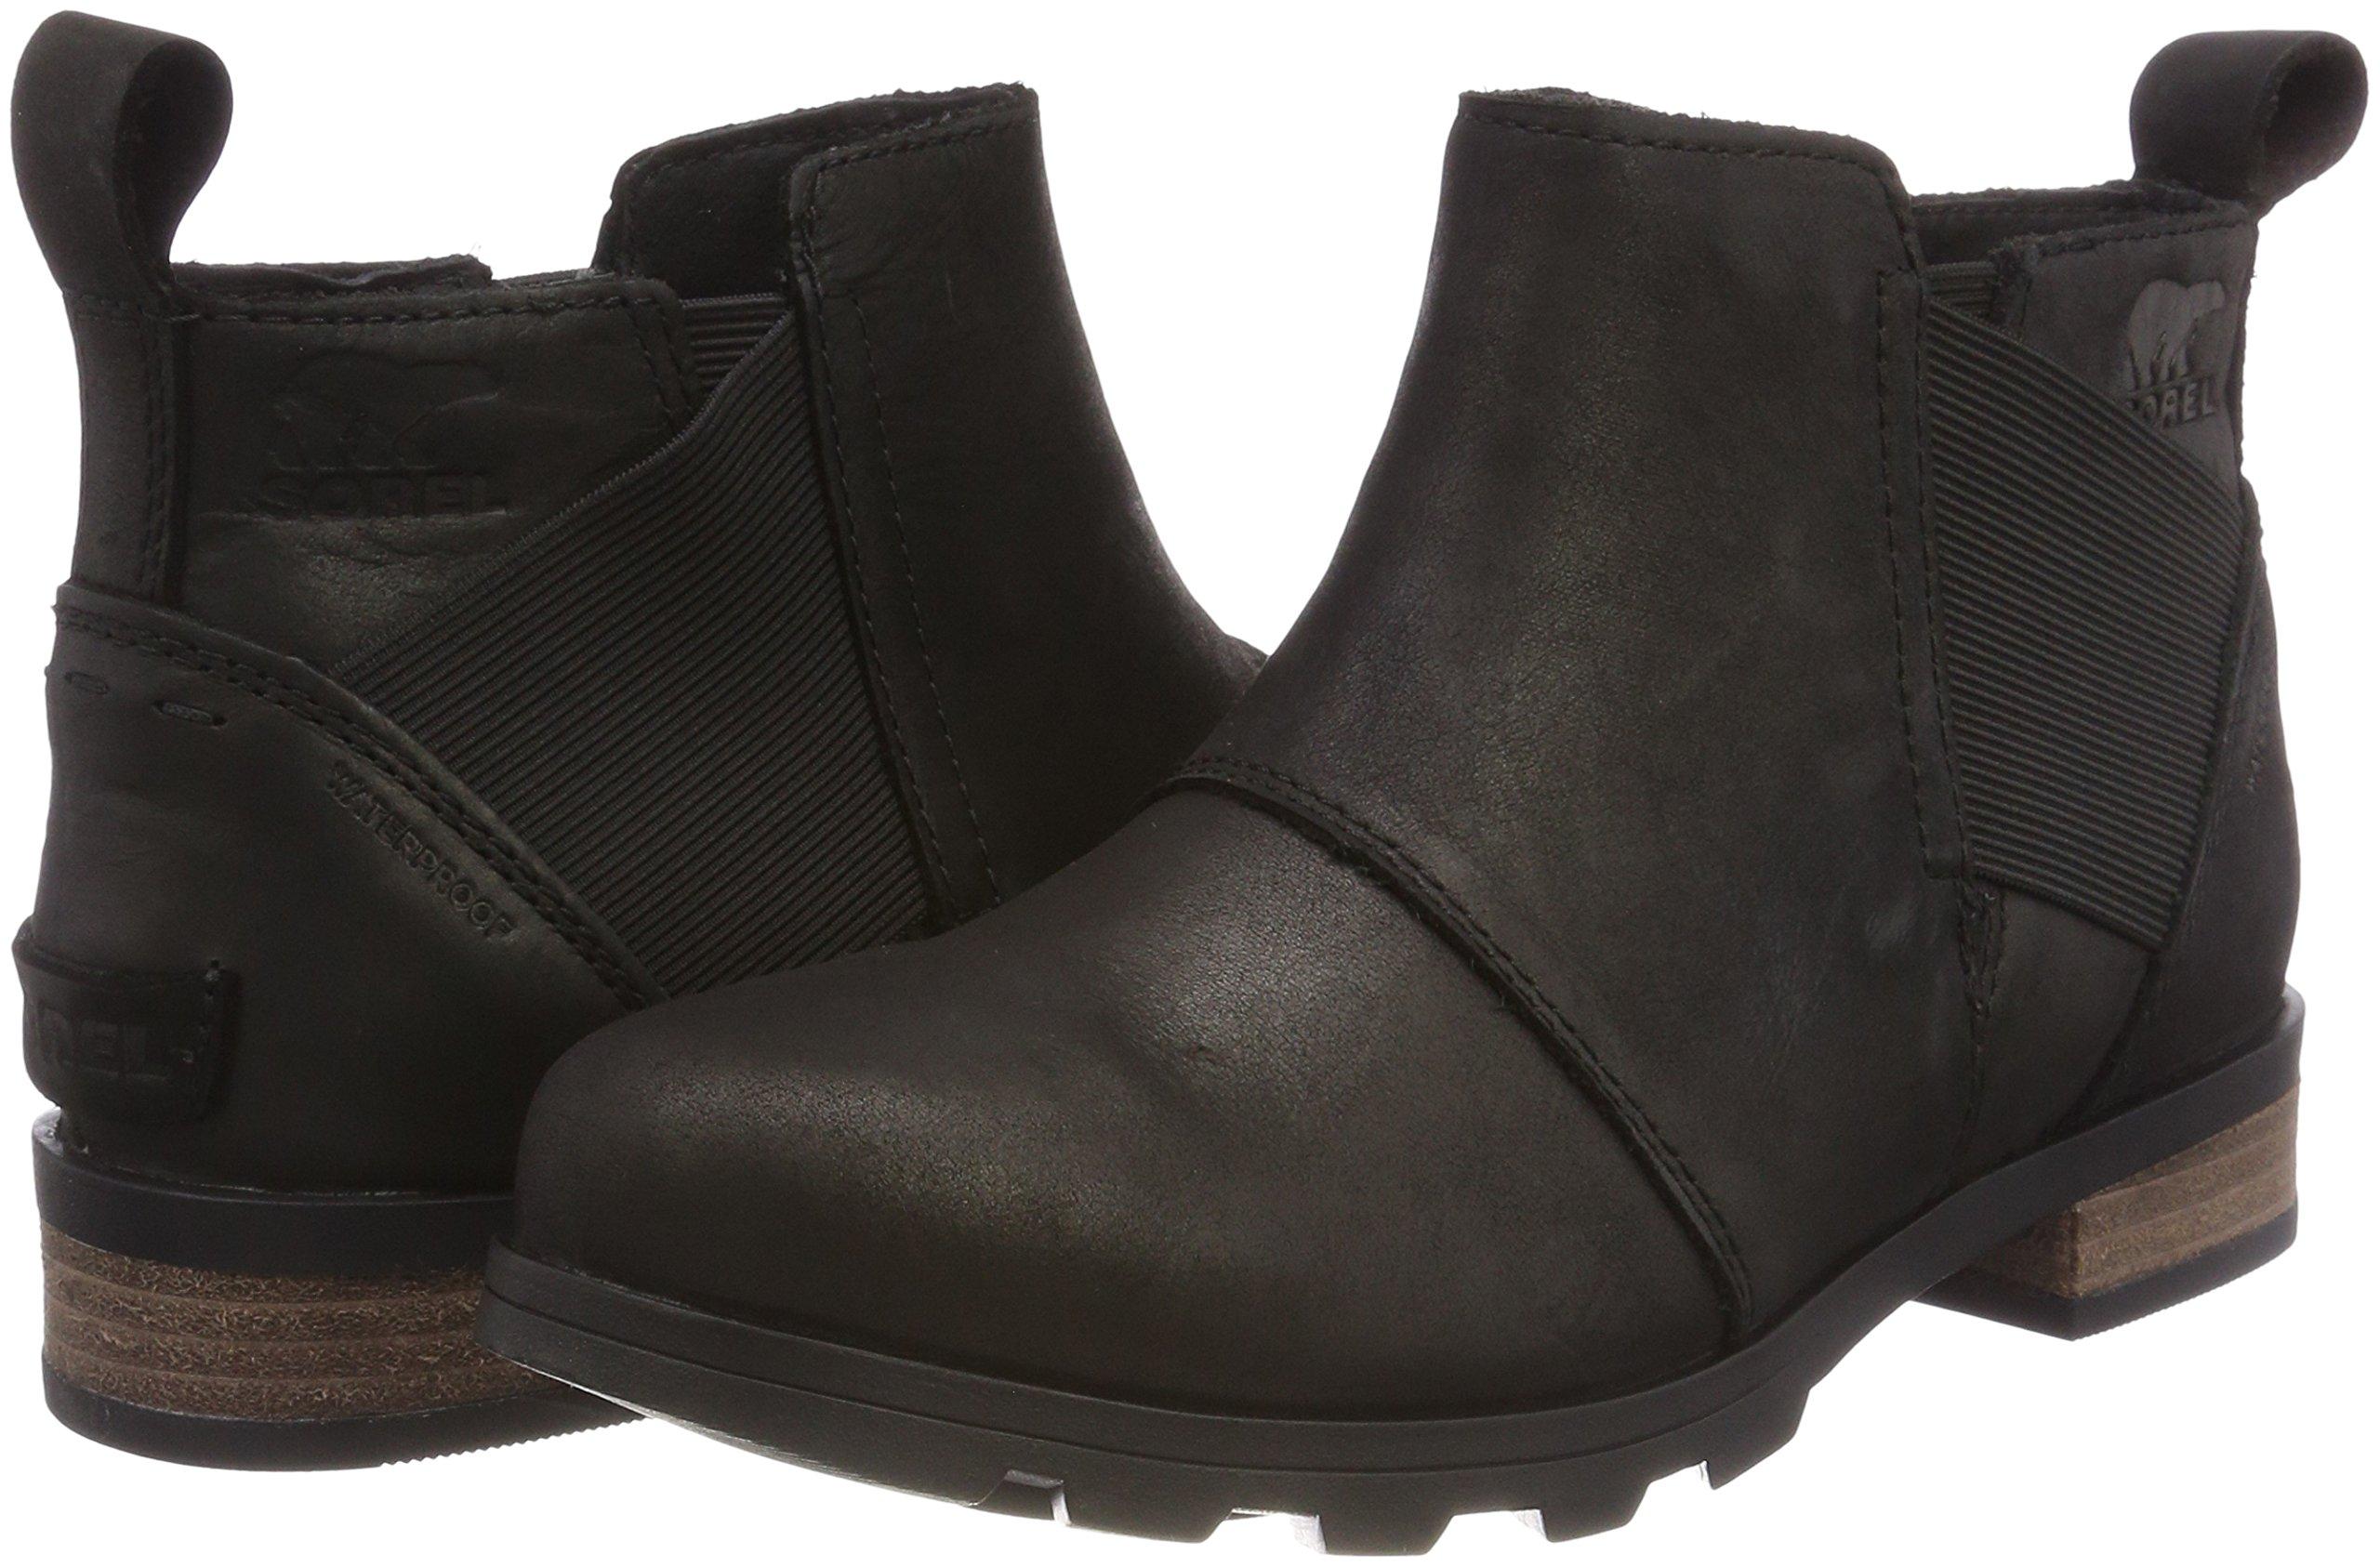 Sorel Womens Emelie Chelsea Black Boot - 8 by SOREL (Image #5)